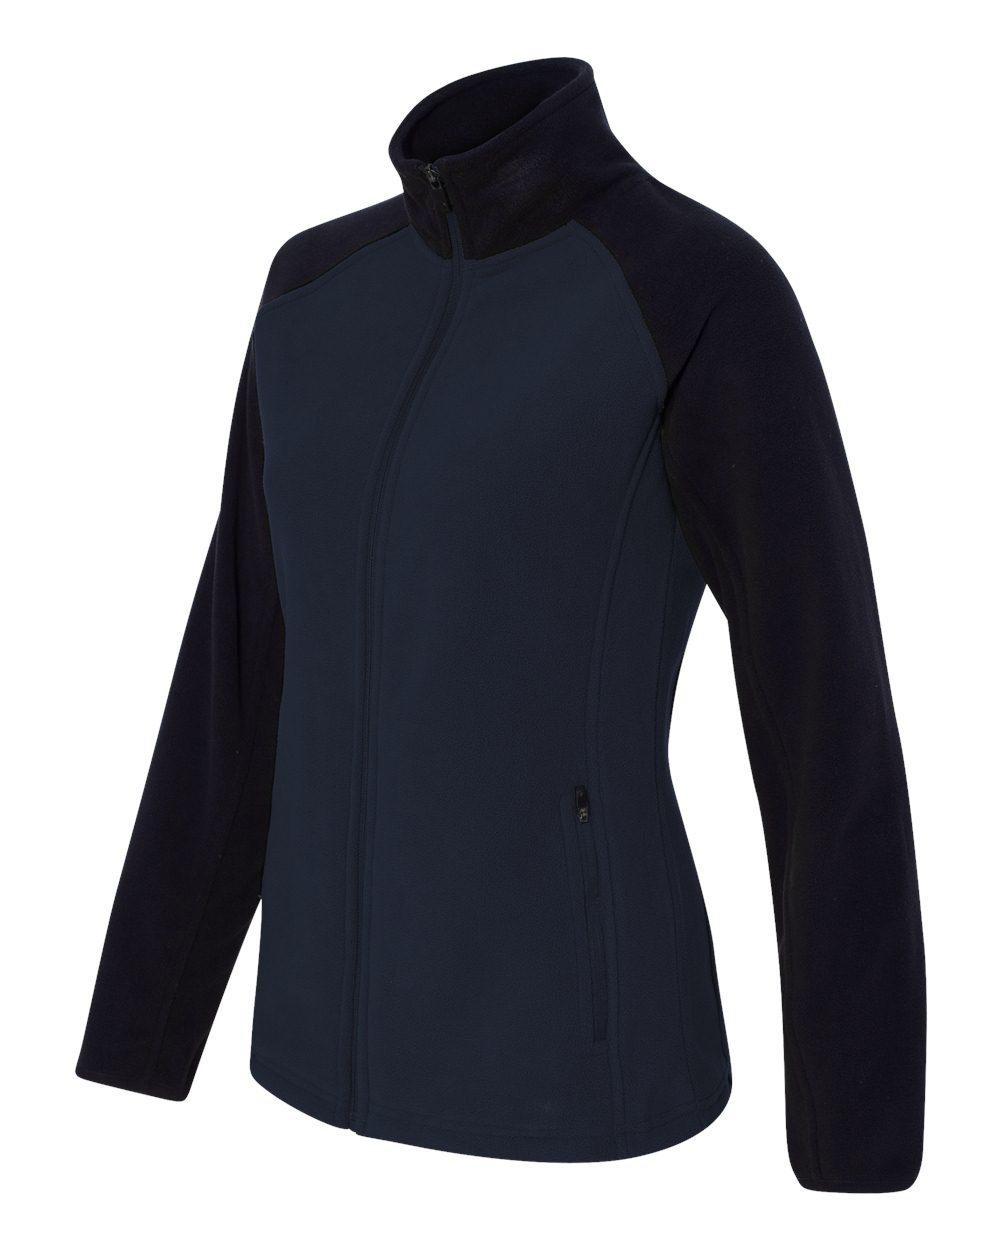 Colorado Clothing 7206 - Ladies' Steamboat Microfleece Jacket